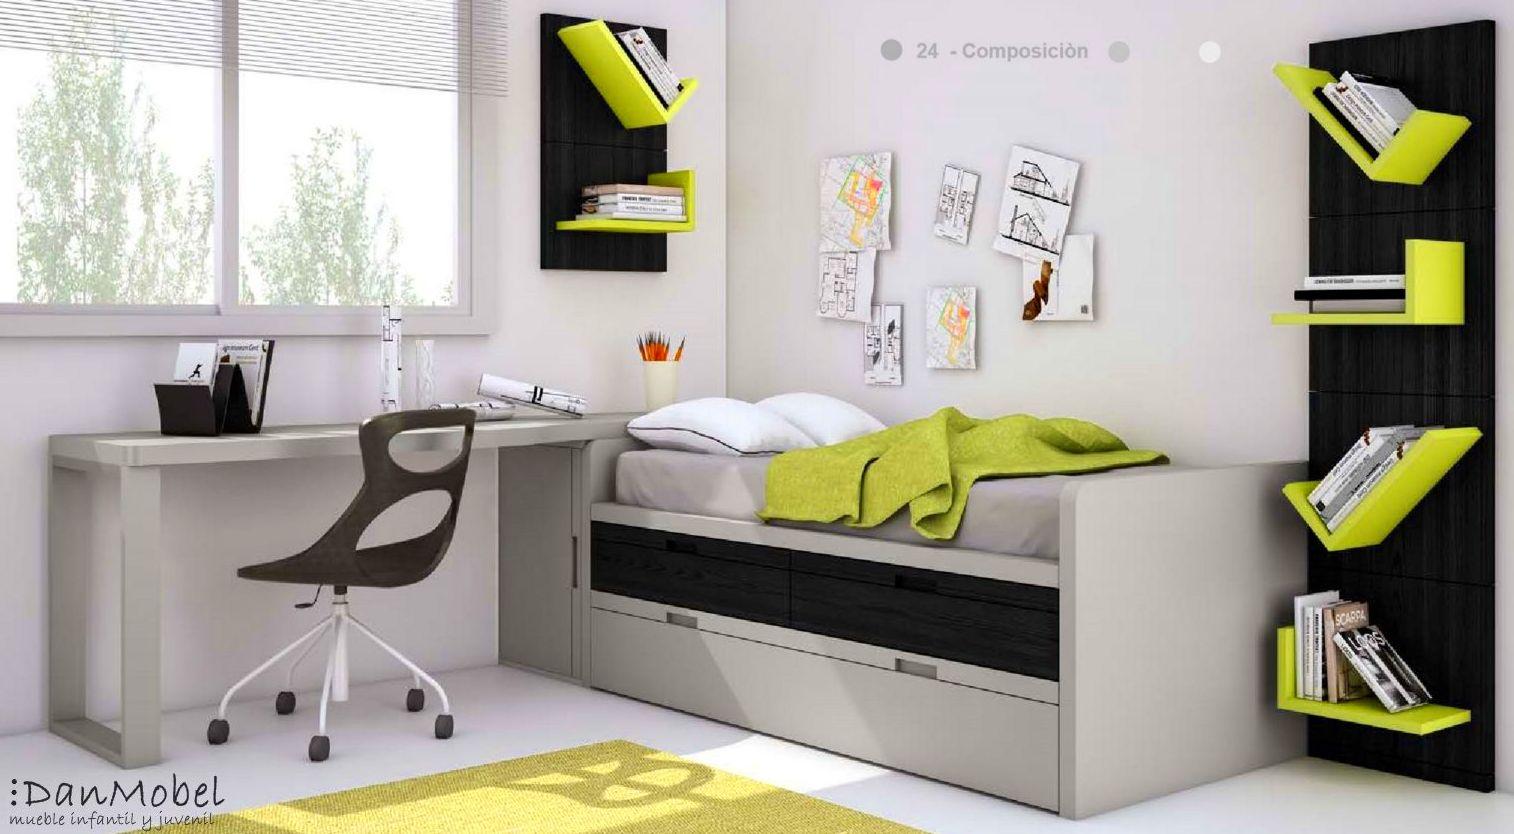 Dormitorio juvenil composición 24